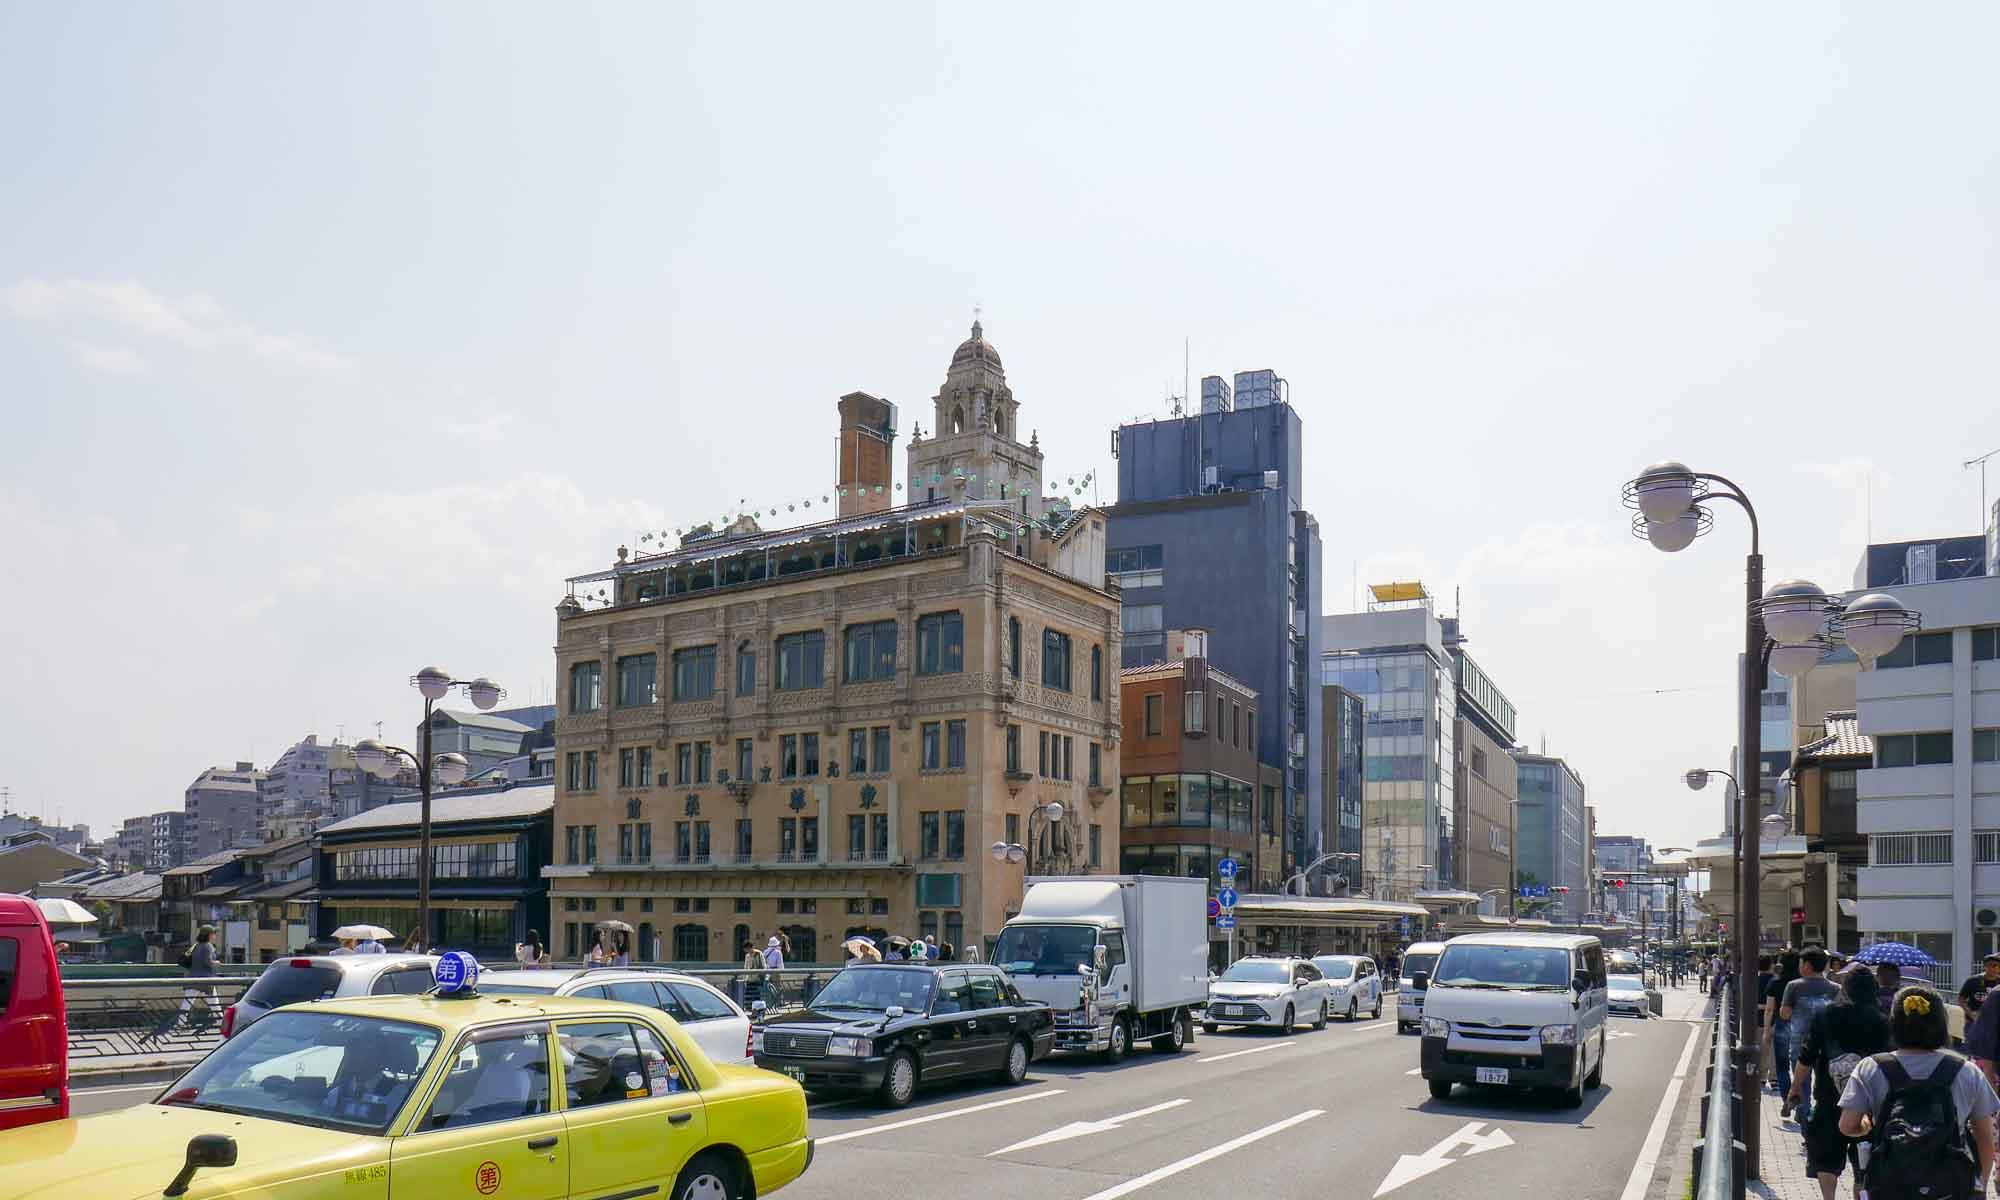 The pre-war Tohkasaikan Building at the Shijo bridge